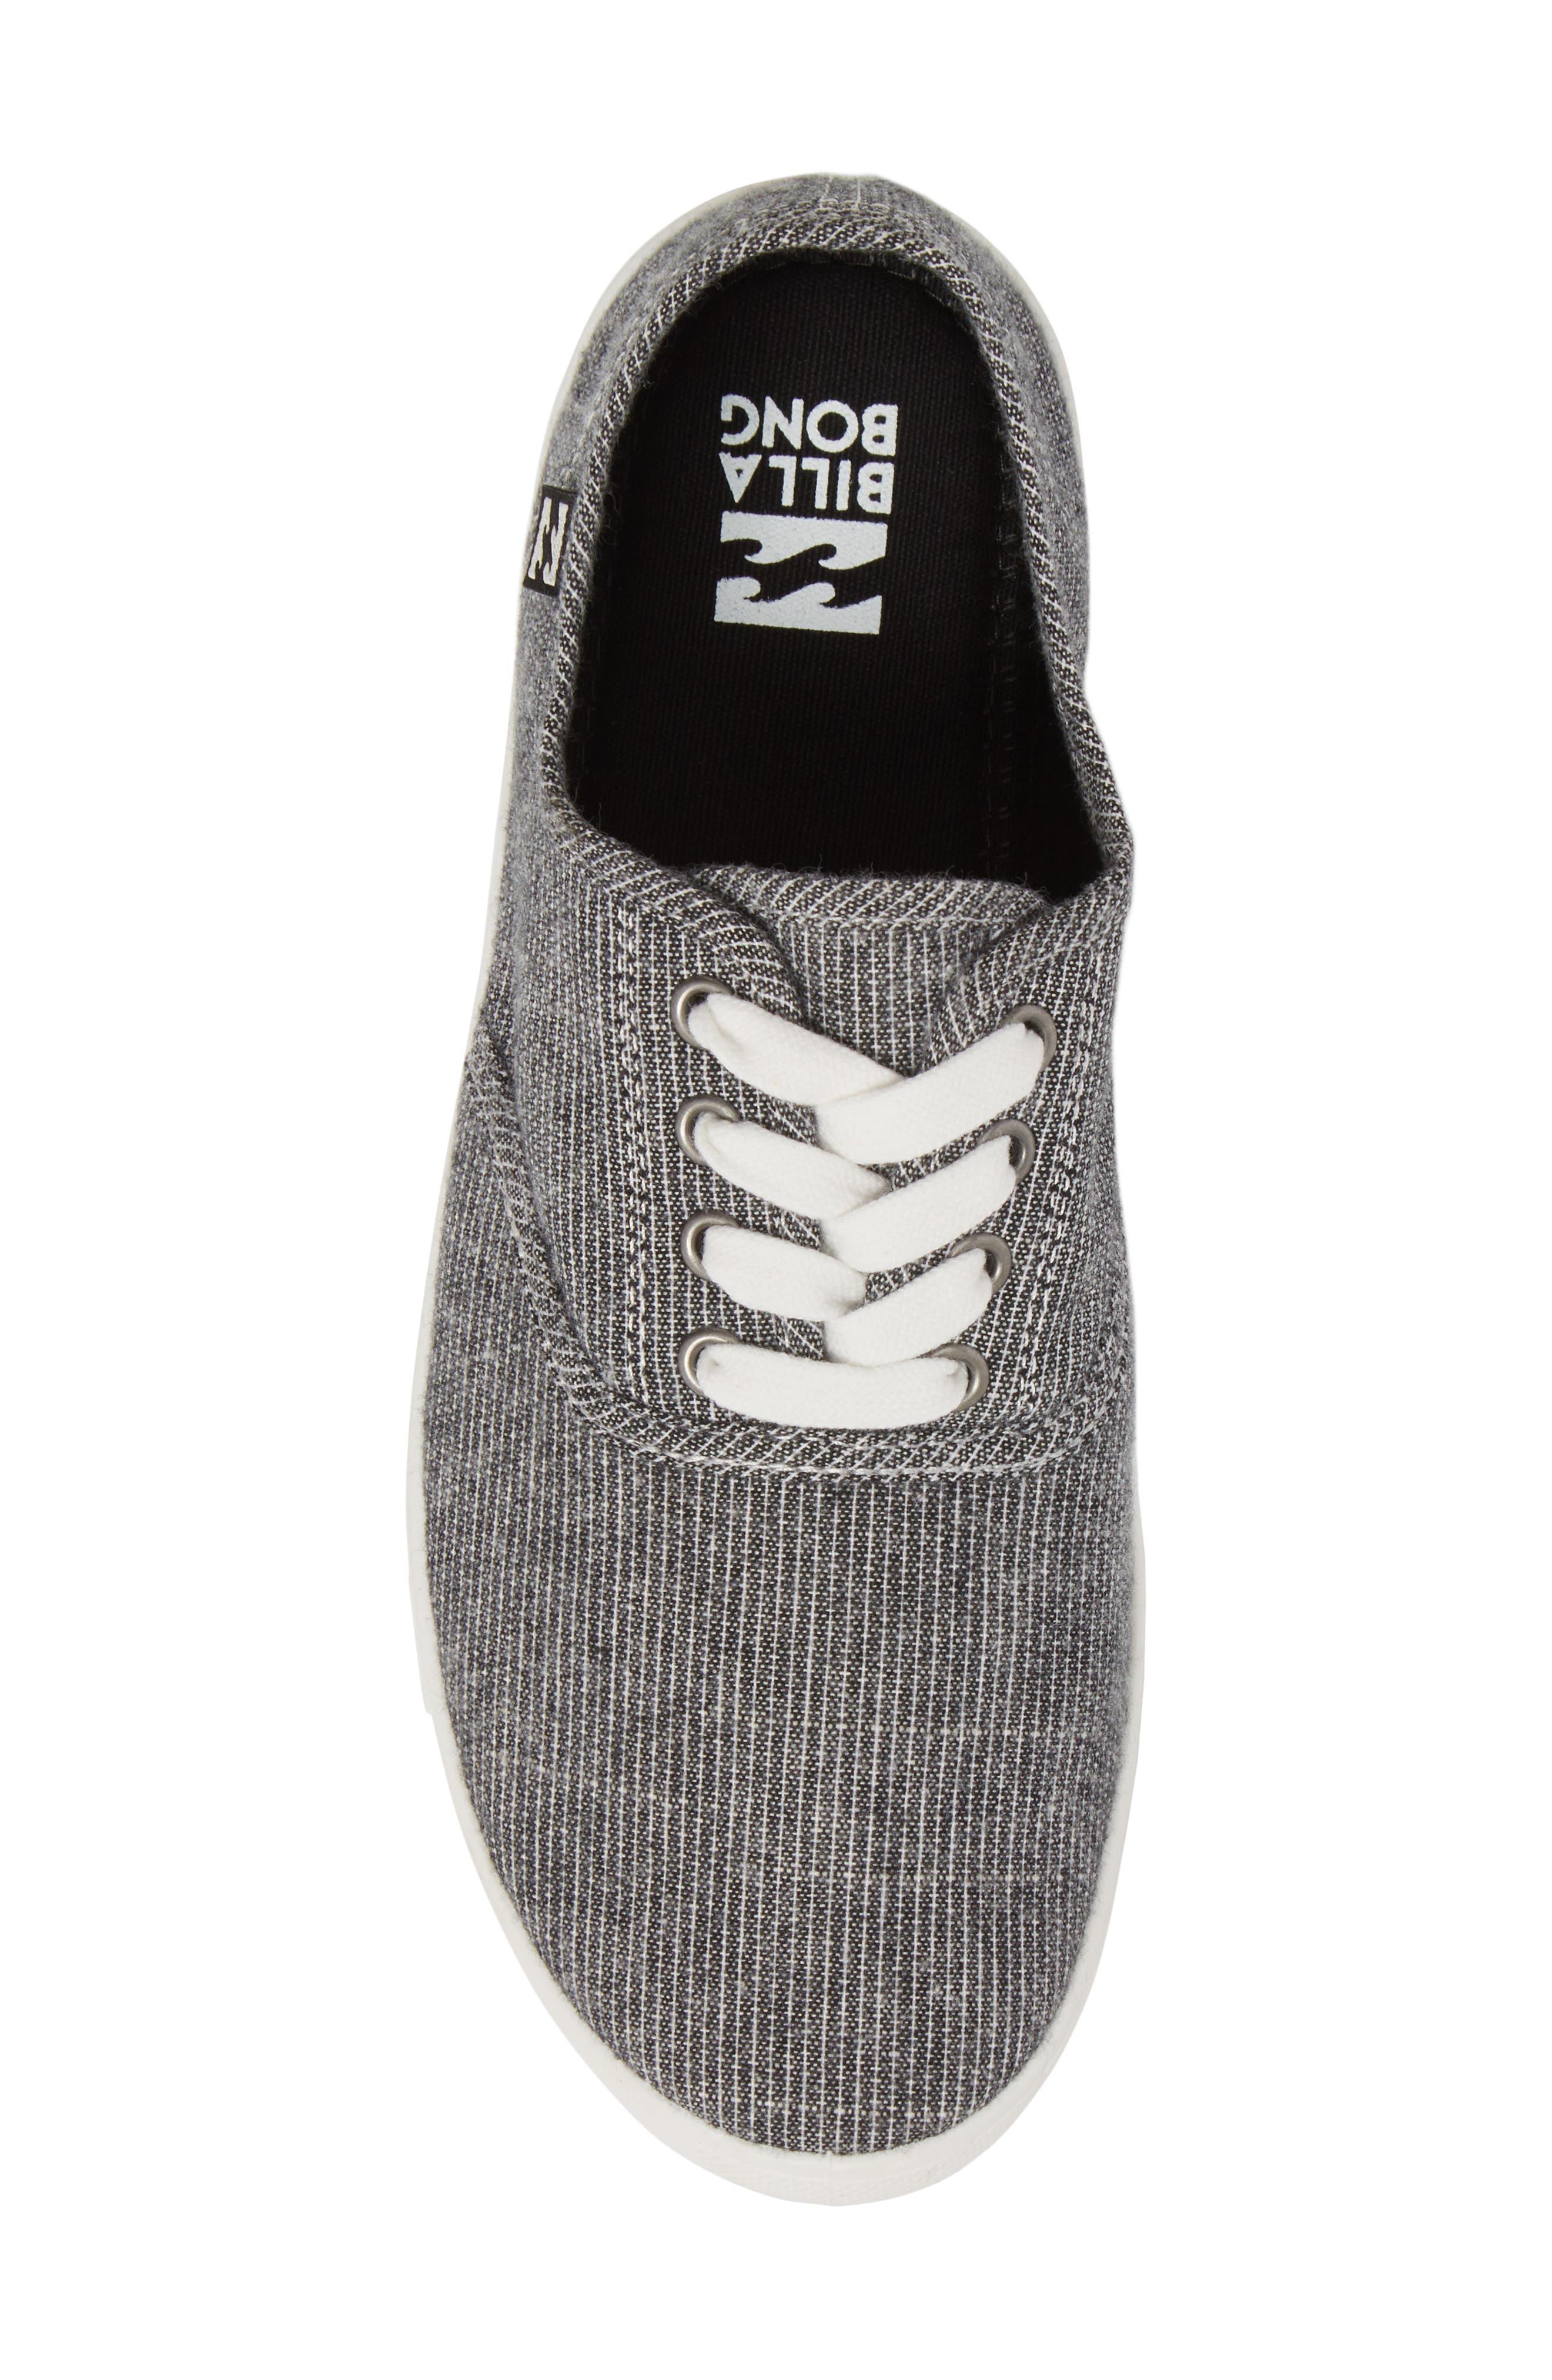 Addy Sneaker,                             Alternate thumbnail 5, color,                             Black/ White